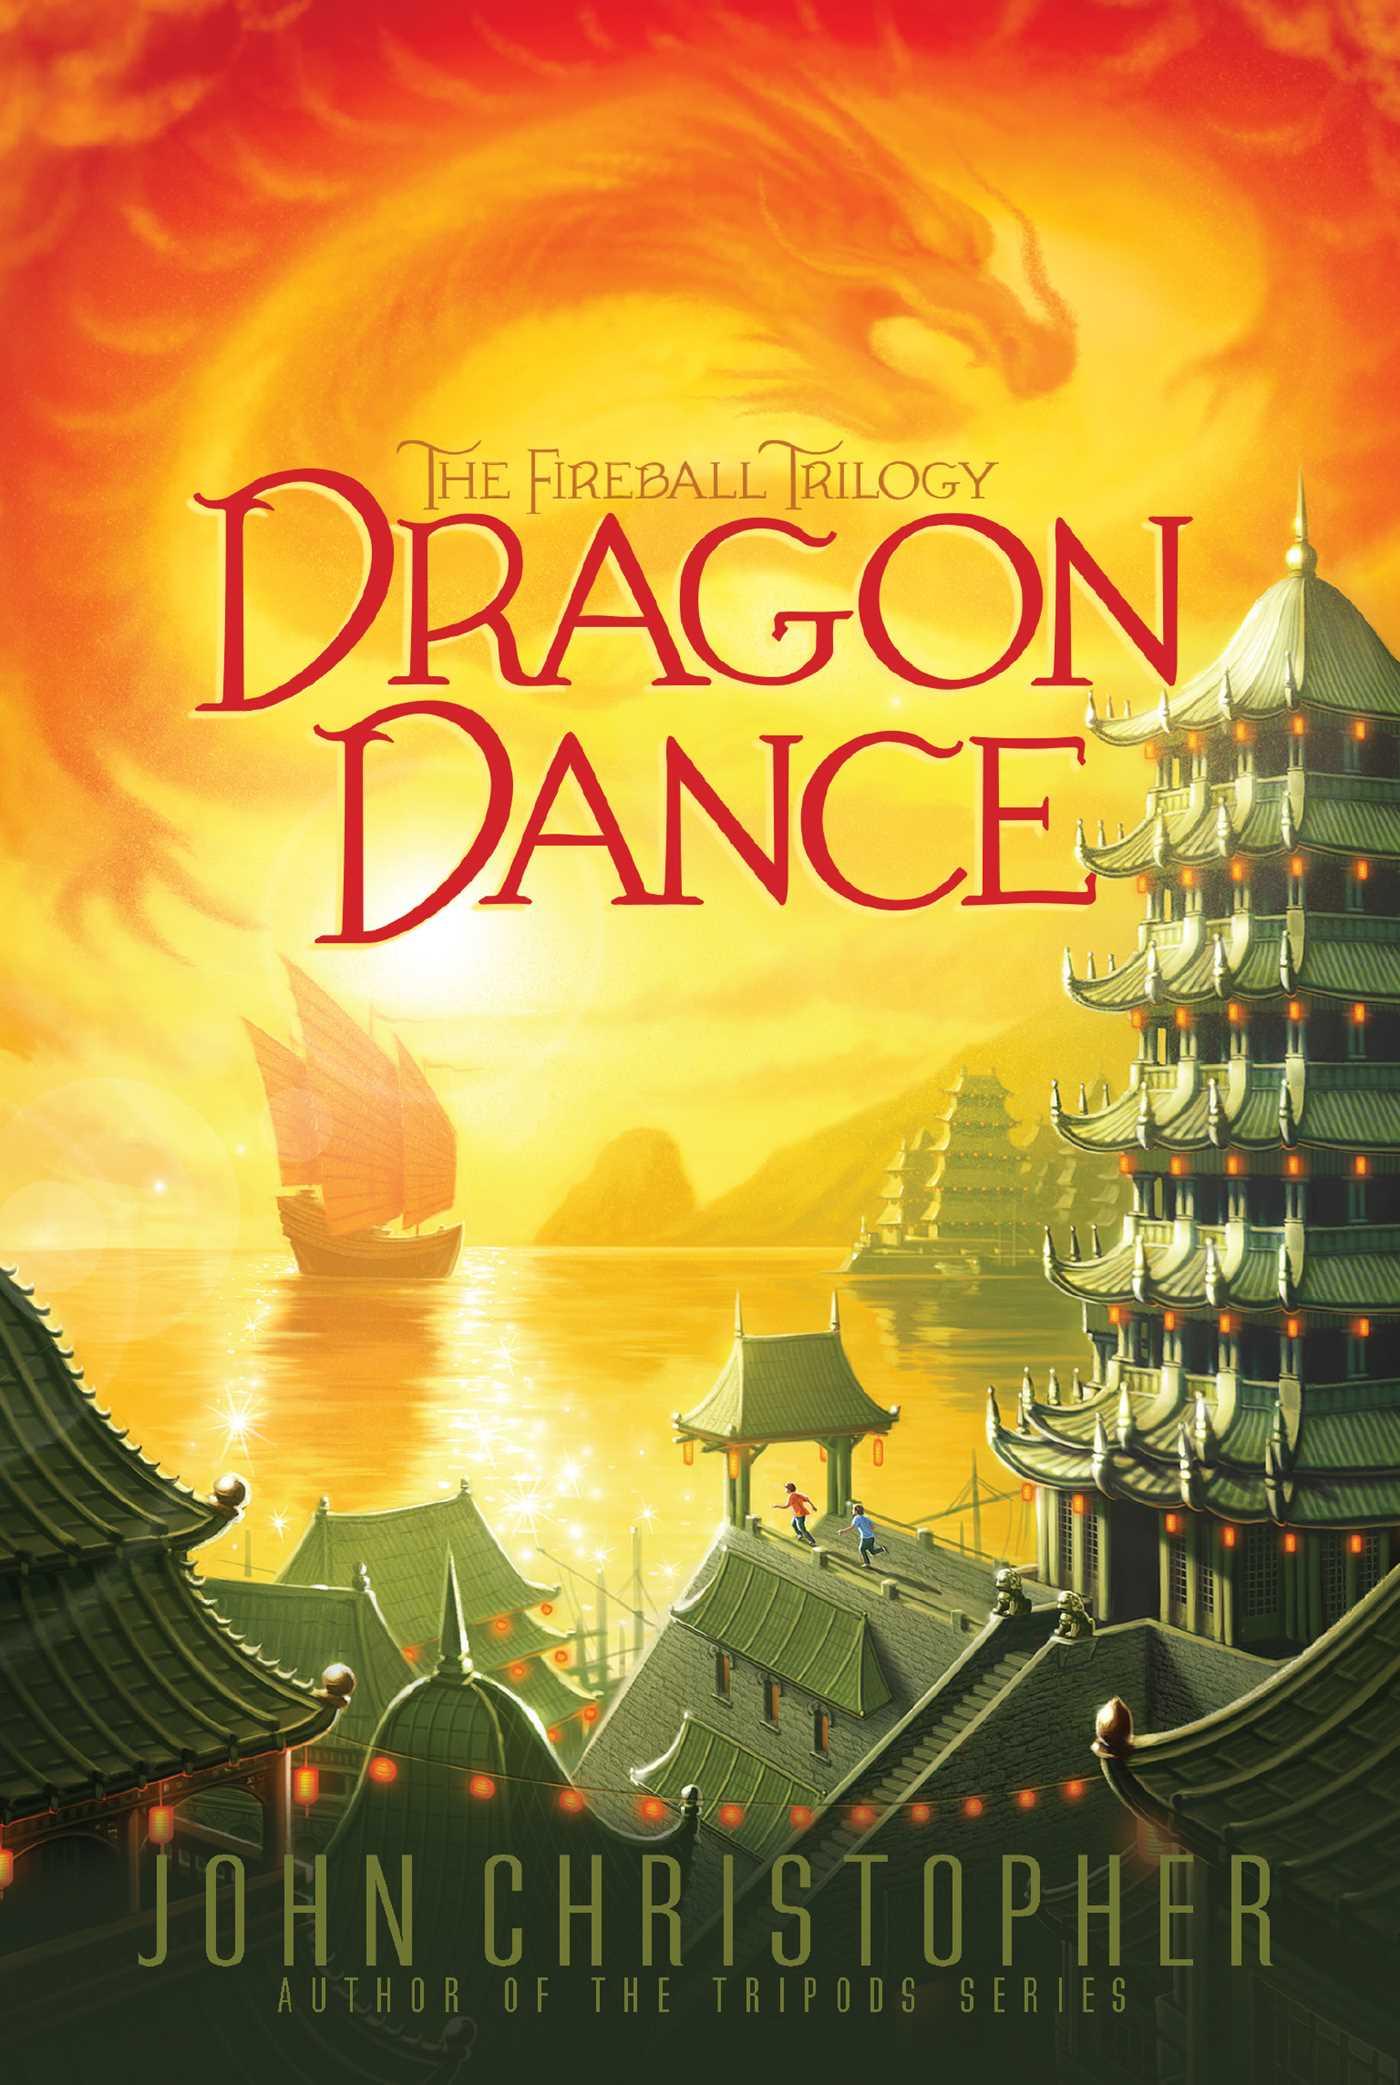 Dragon dance 9781481420150 hr